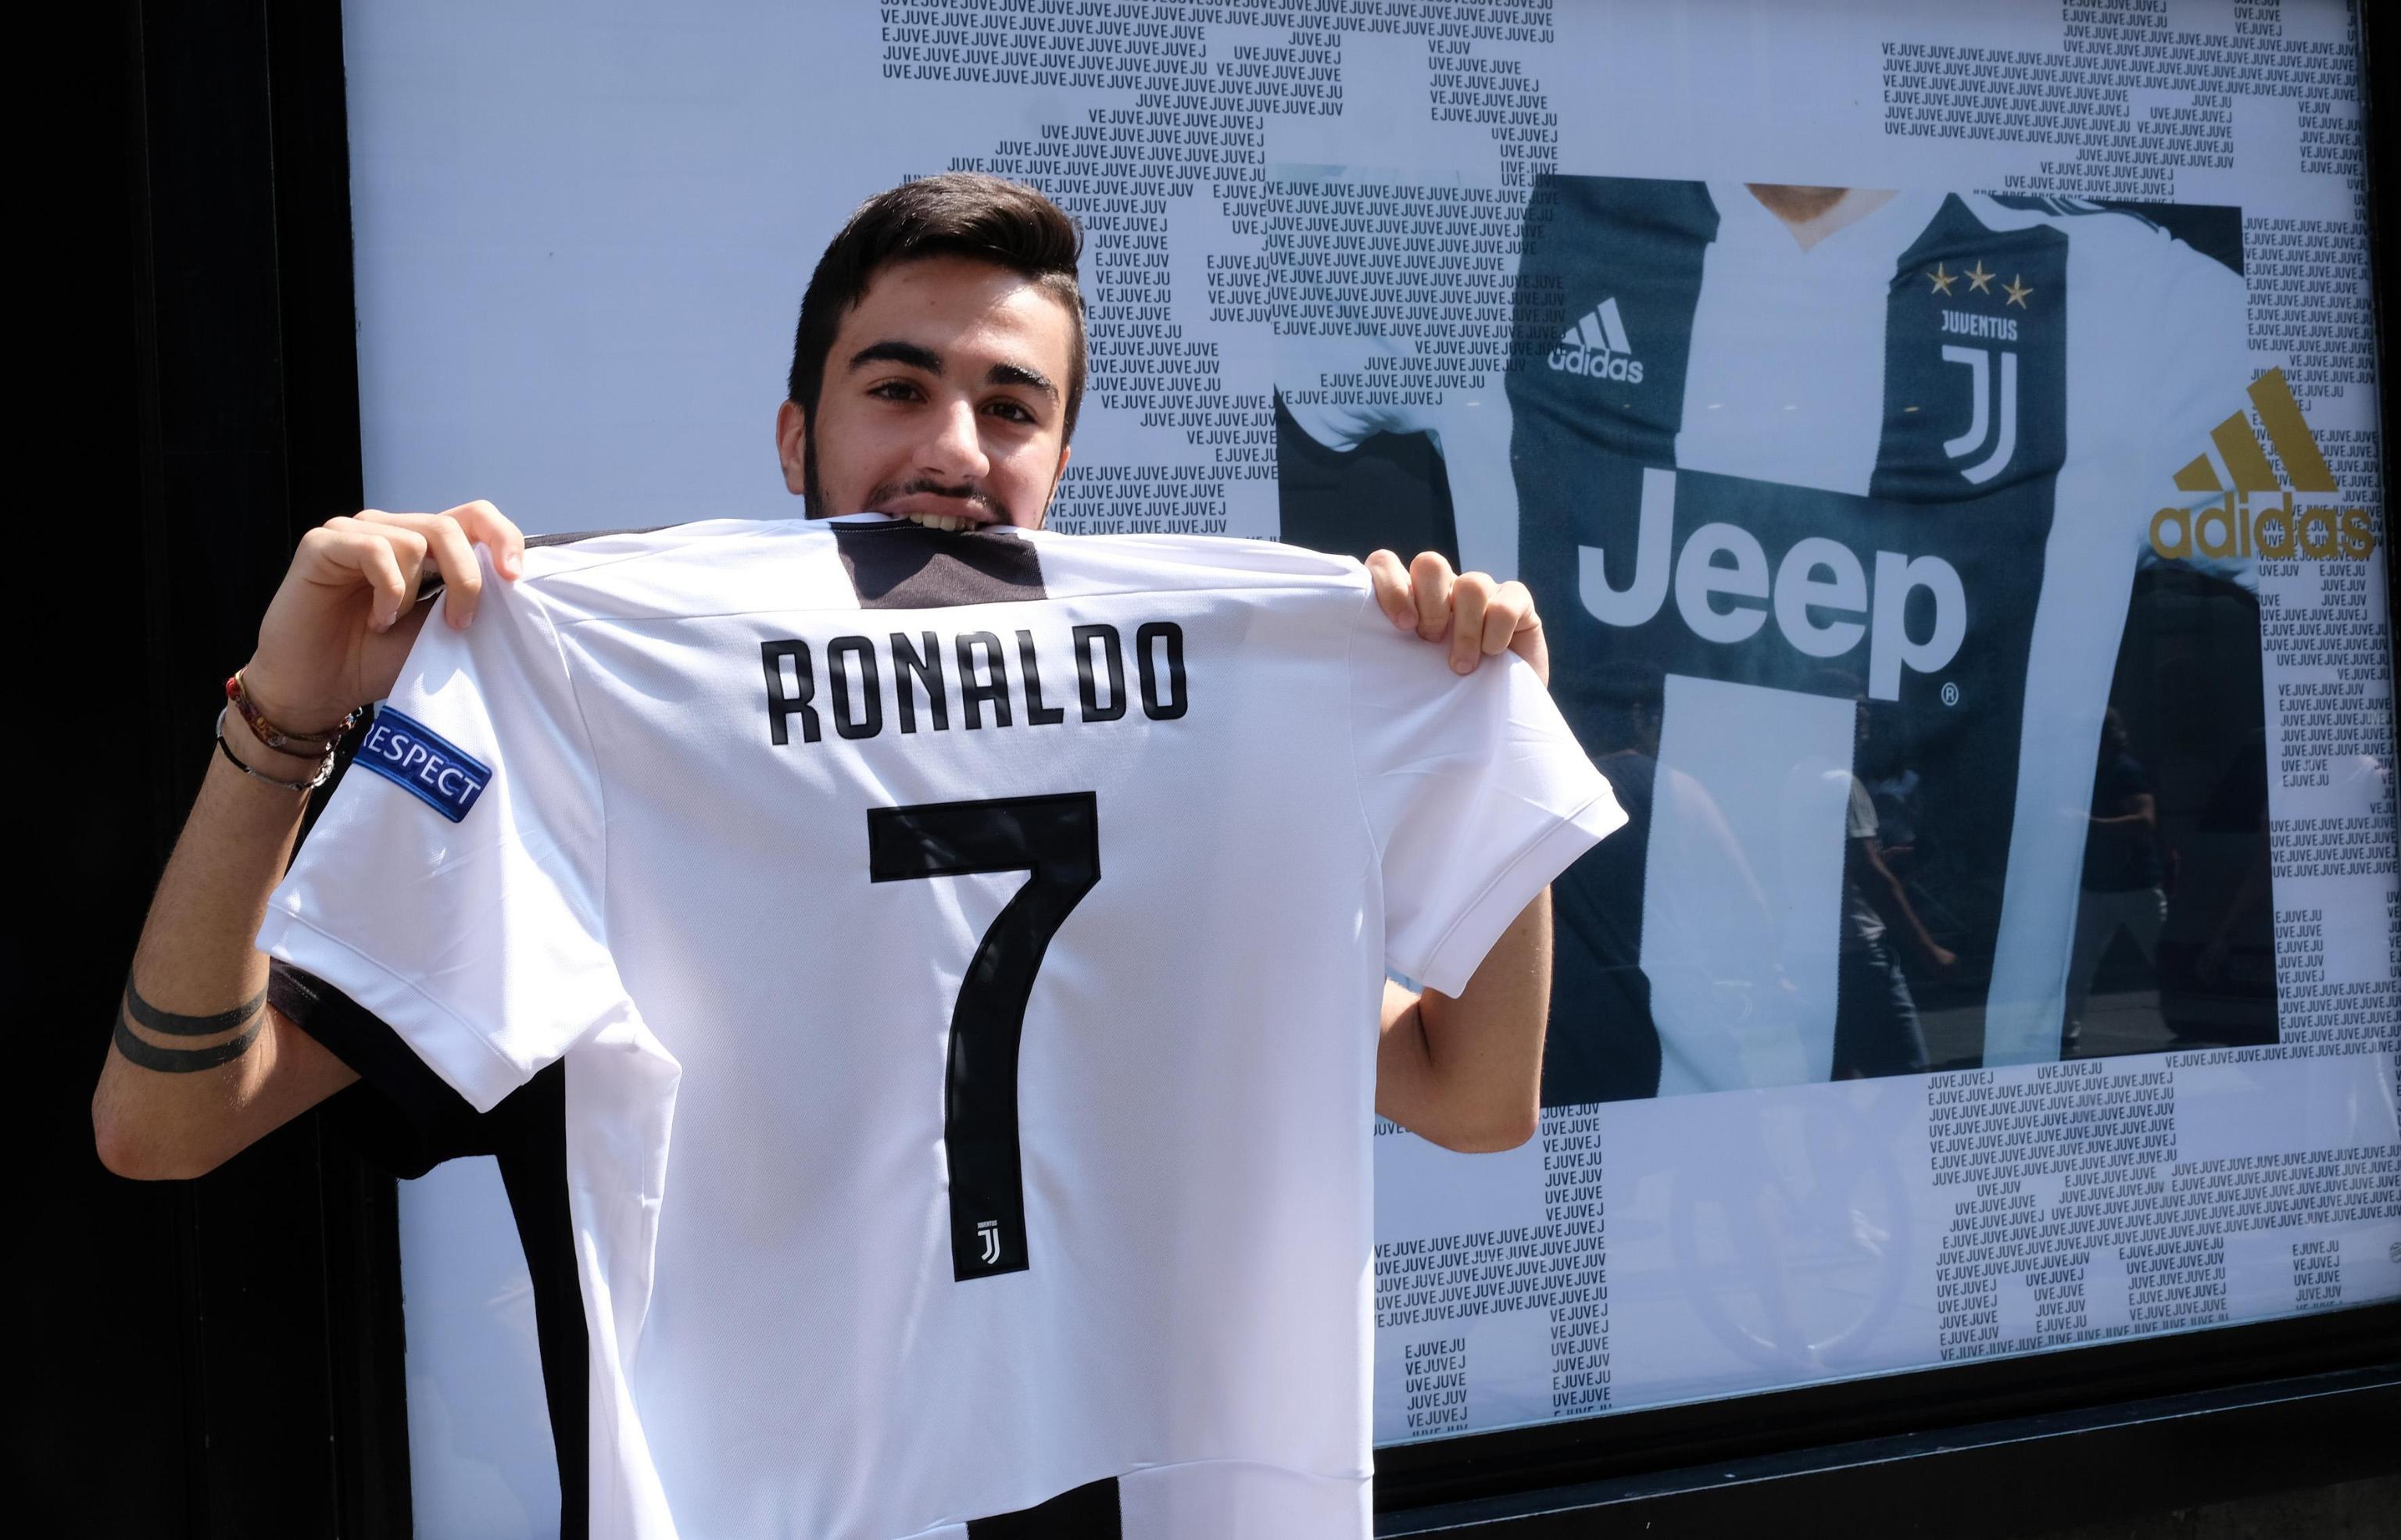 Ronaldo Juventus Fc